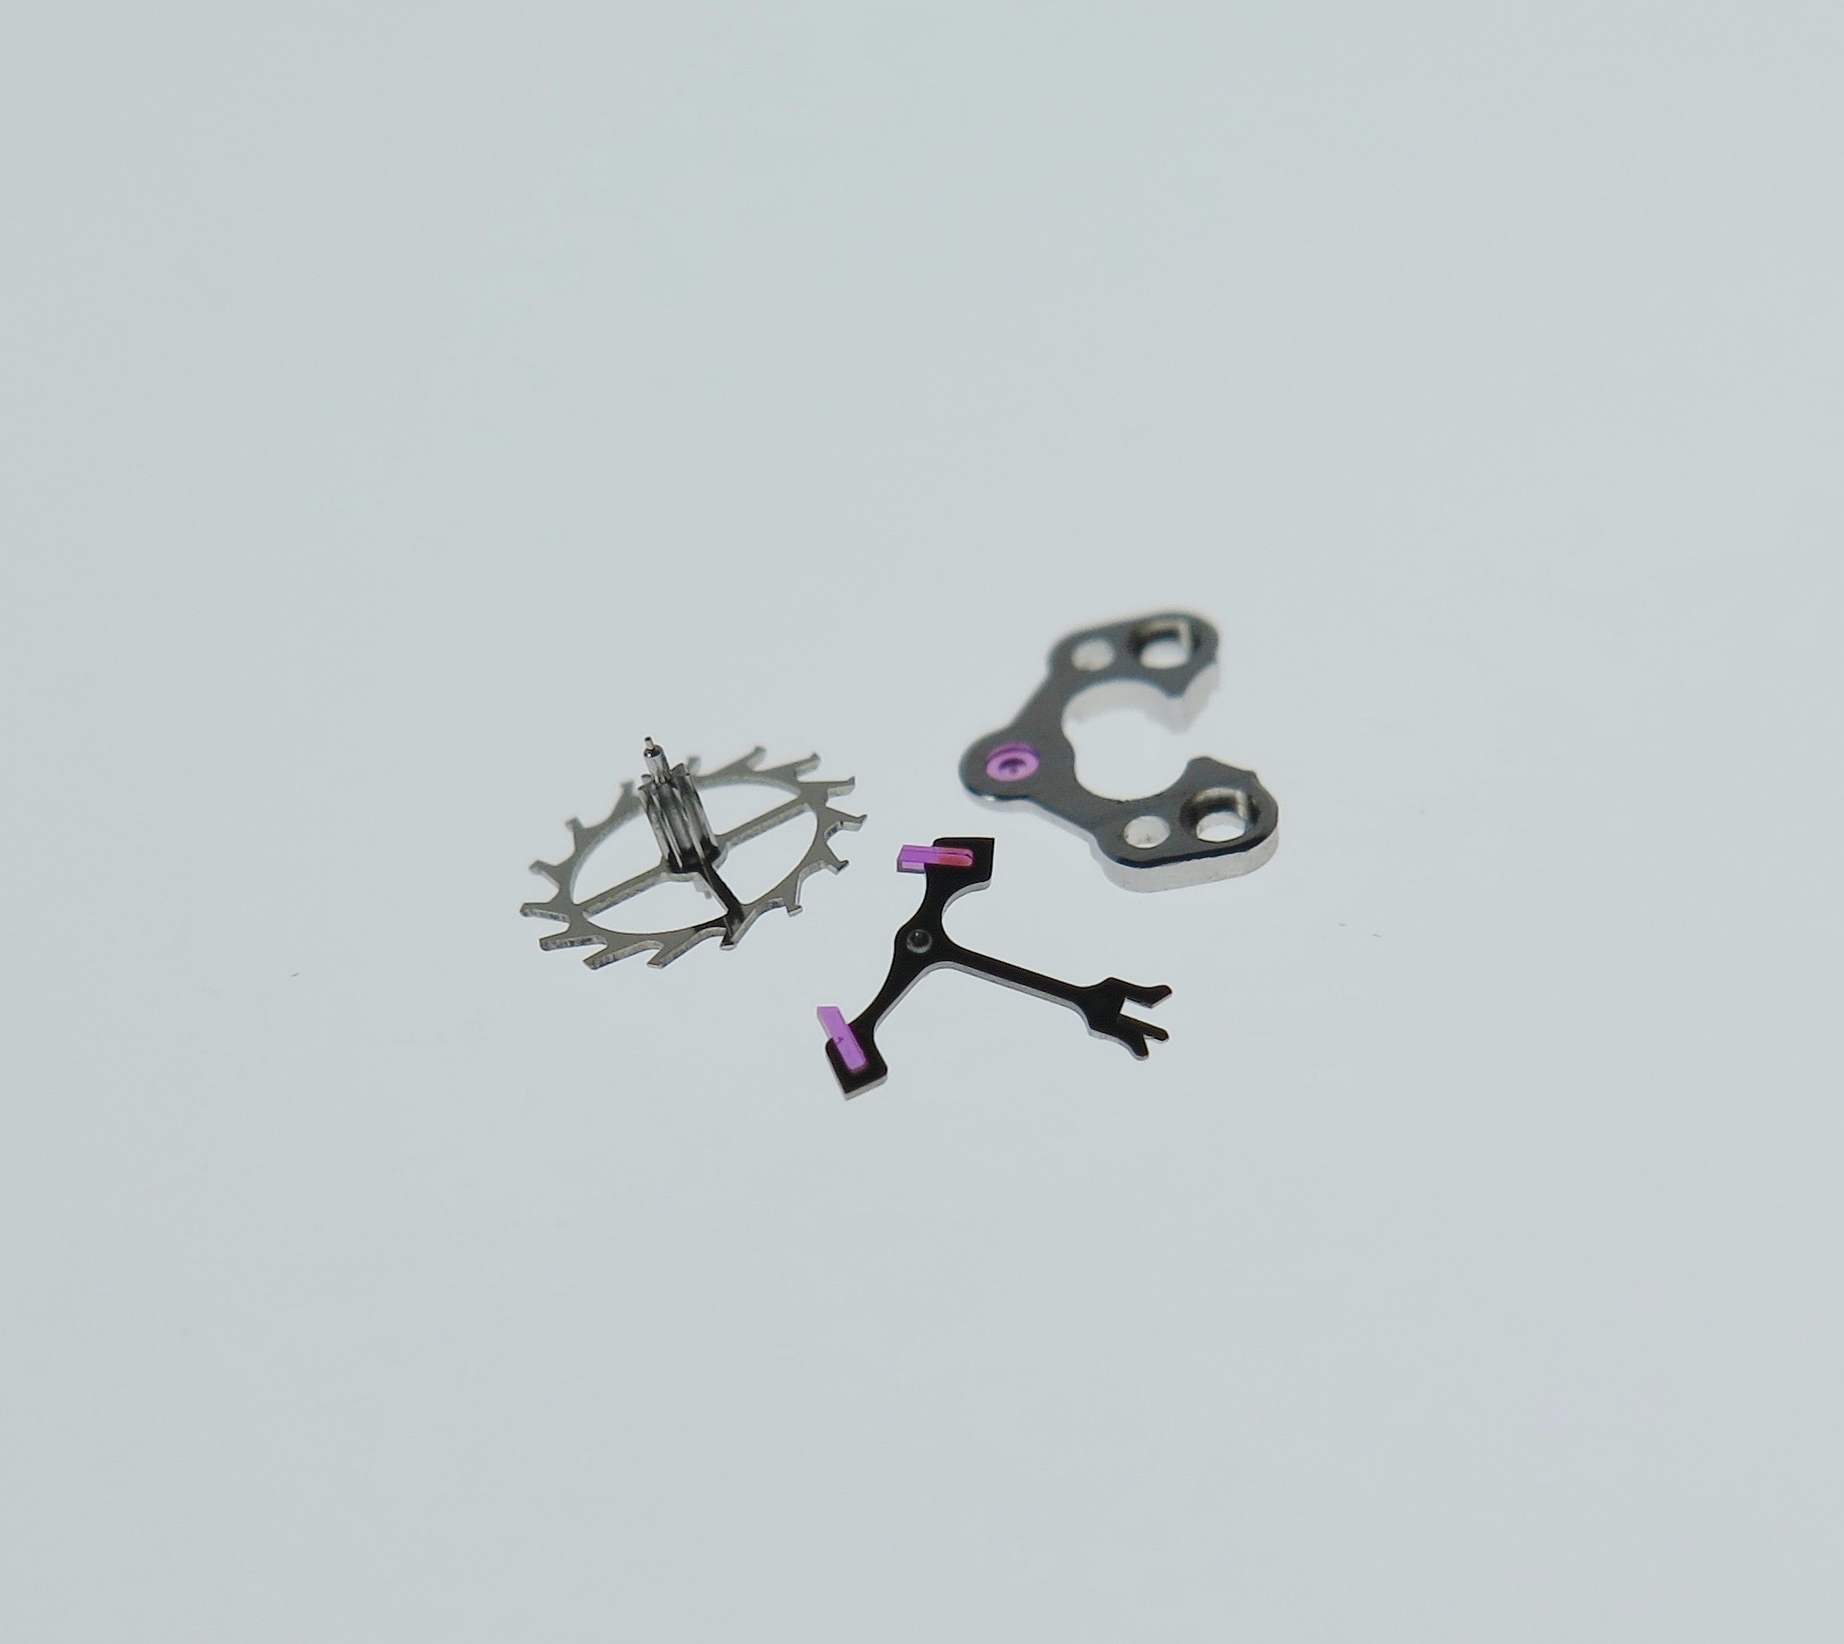 Escape wheel, anchor(pallets) and pallet bride